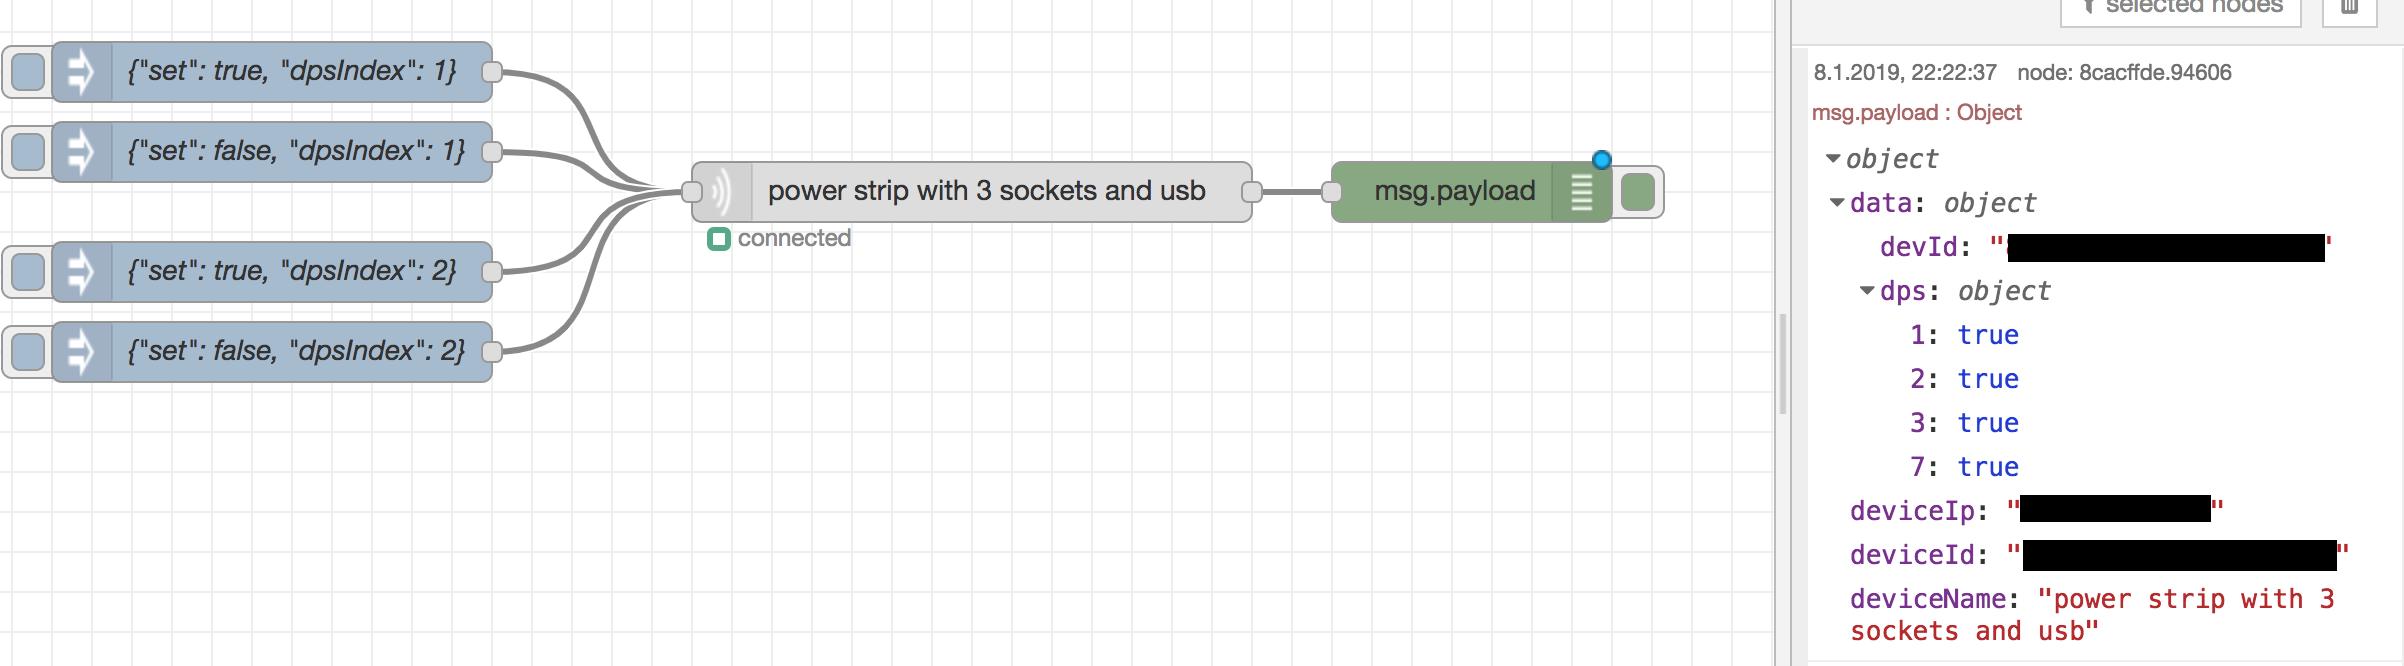 powerstrip input node with input and output format